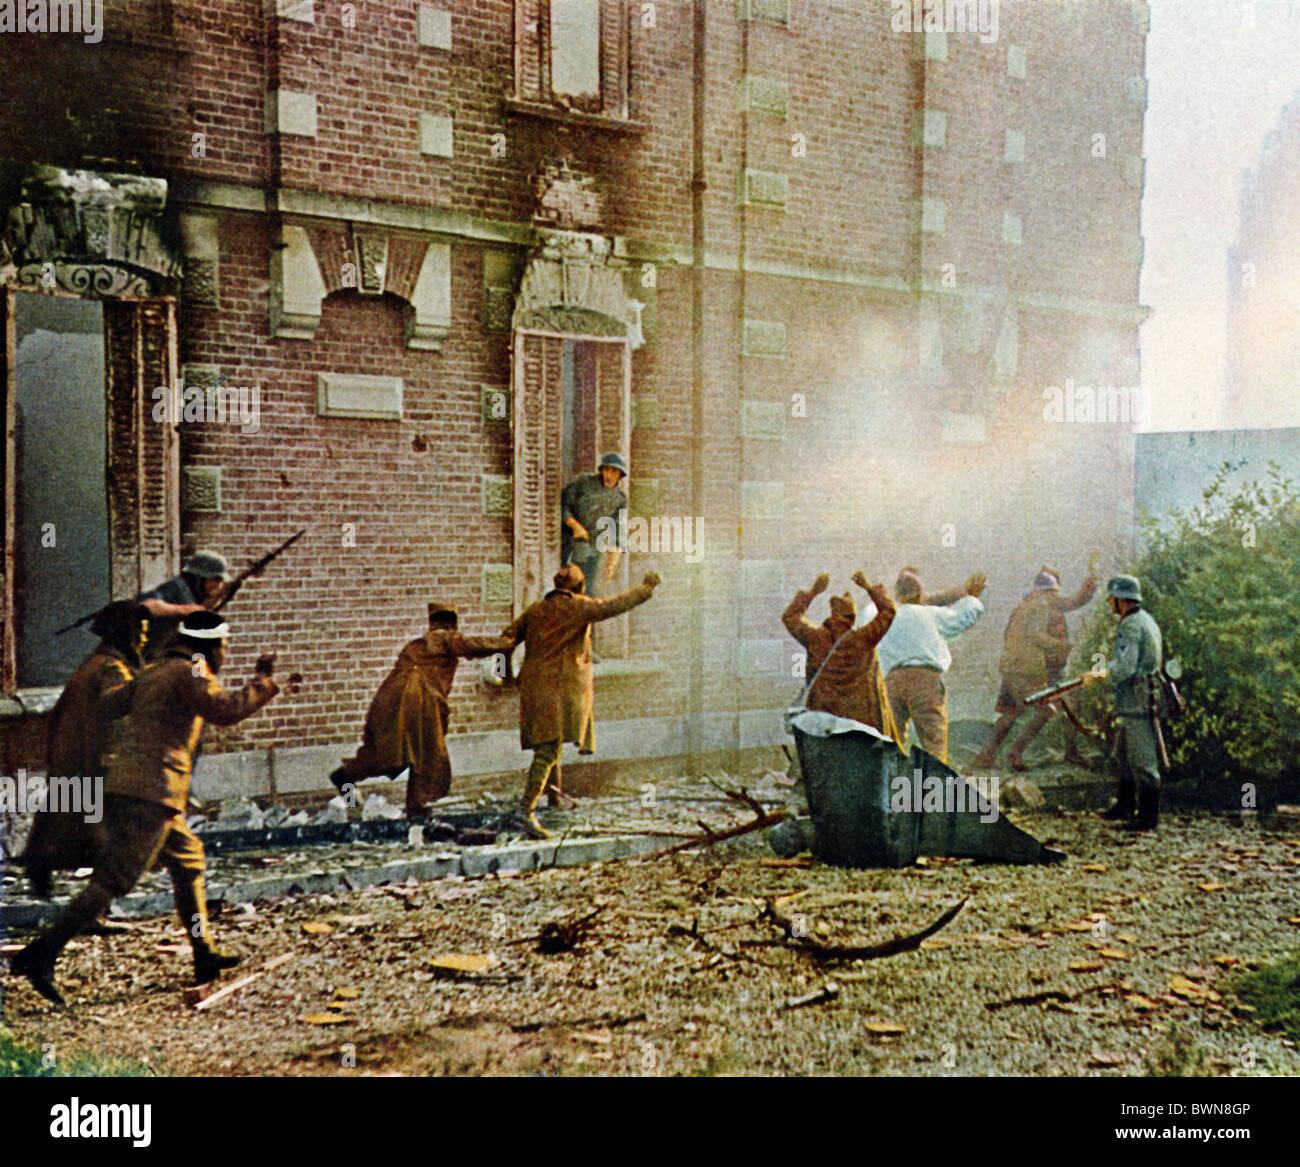 Invasión de Francia de junio de 1940 Antecedentes históricos histórico alemán tropas francesas Imagen De Stock